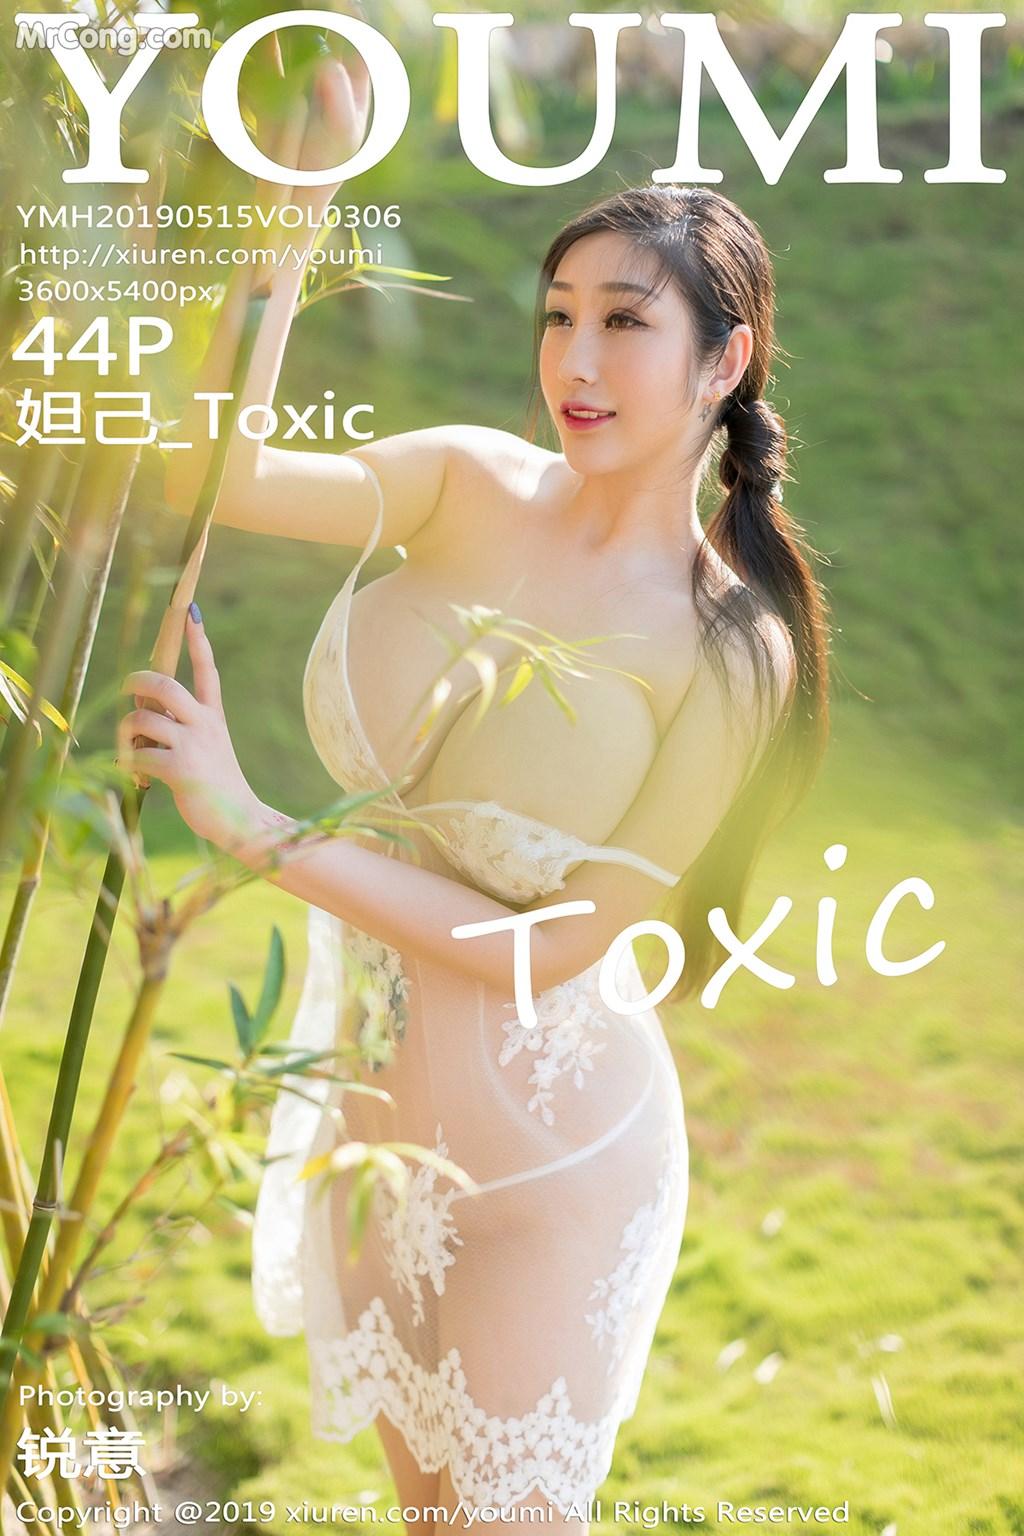 YouMi Vol.306: Daji_Toxic (妲己_Toxic) (45 ảnh)